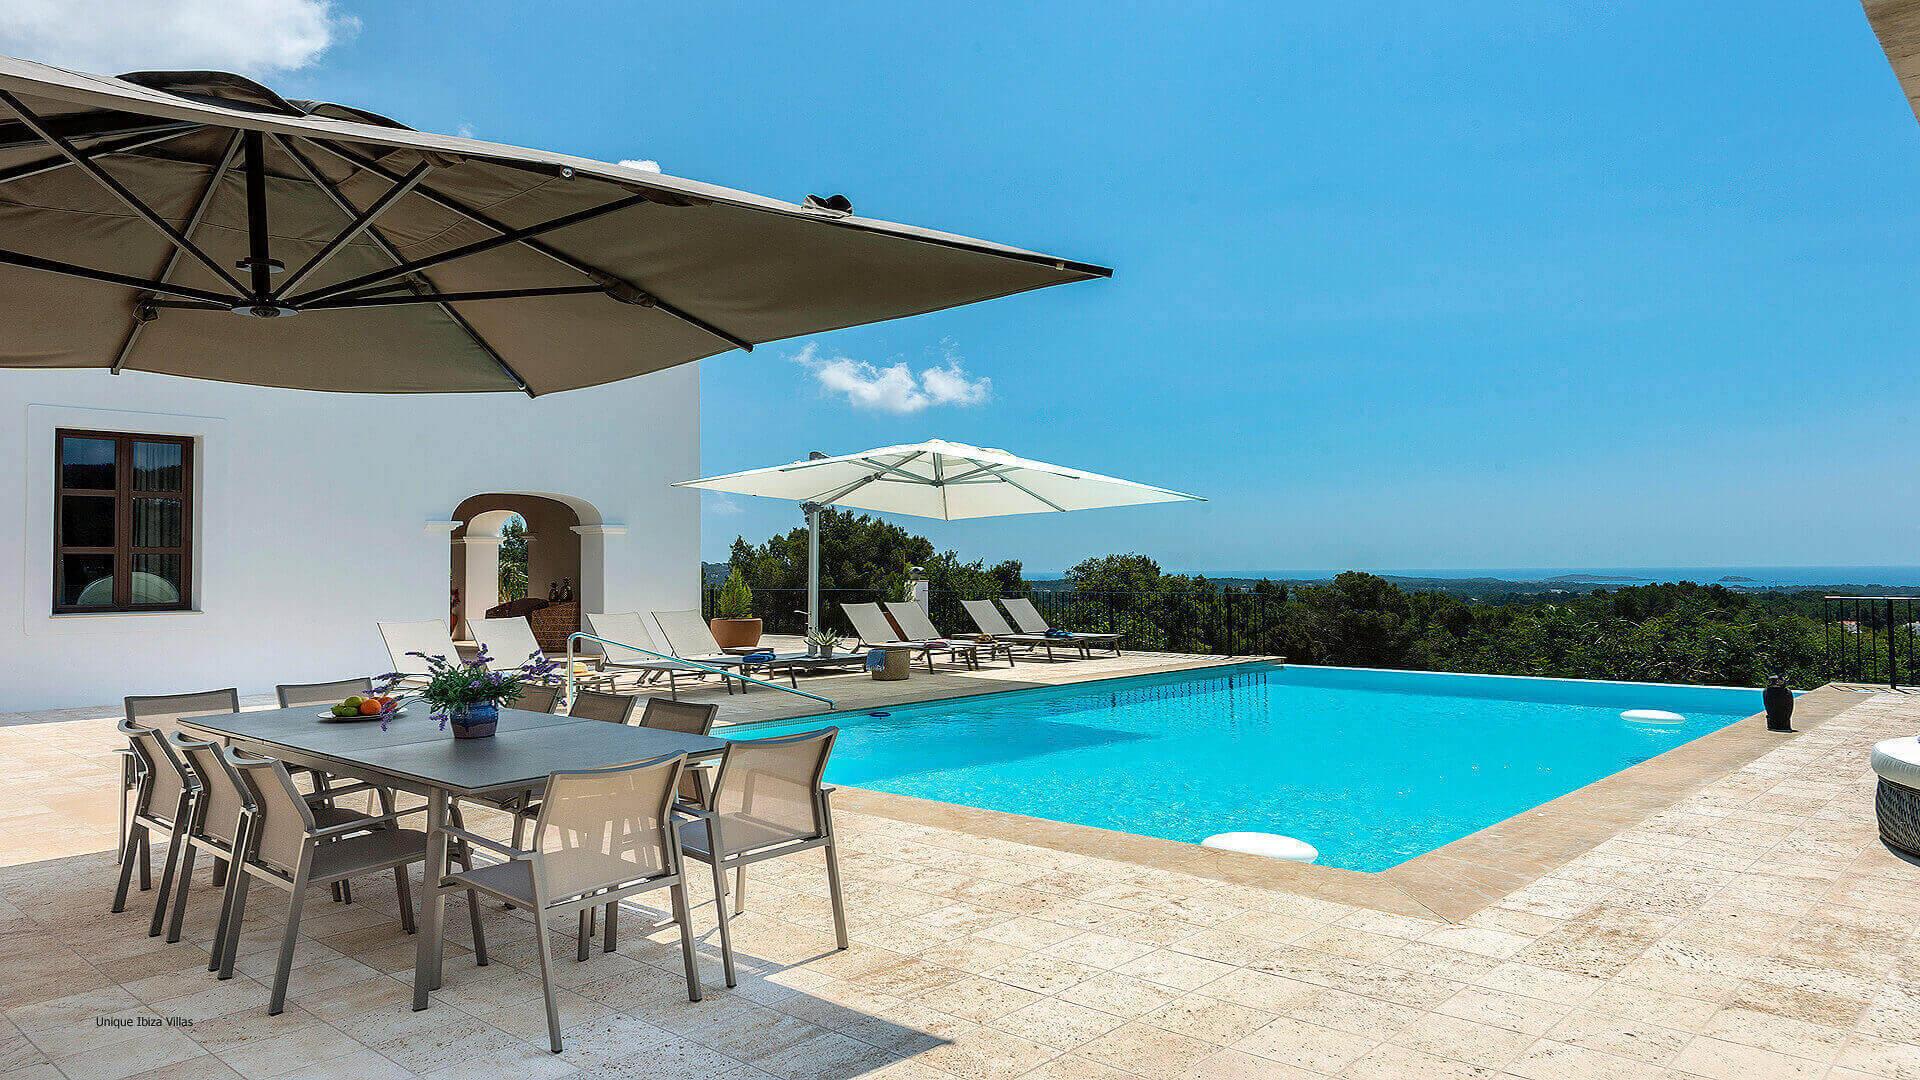 Casa Prats Ibiza 13 Santa Eulalia